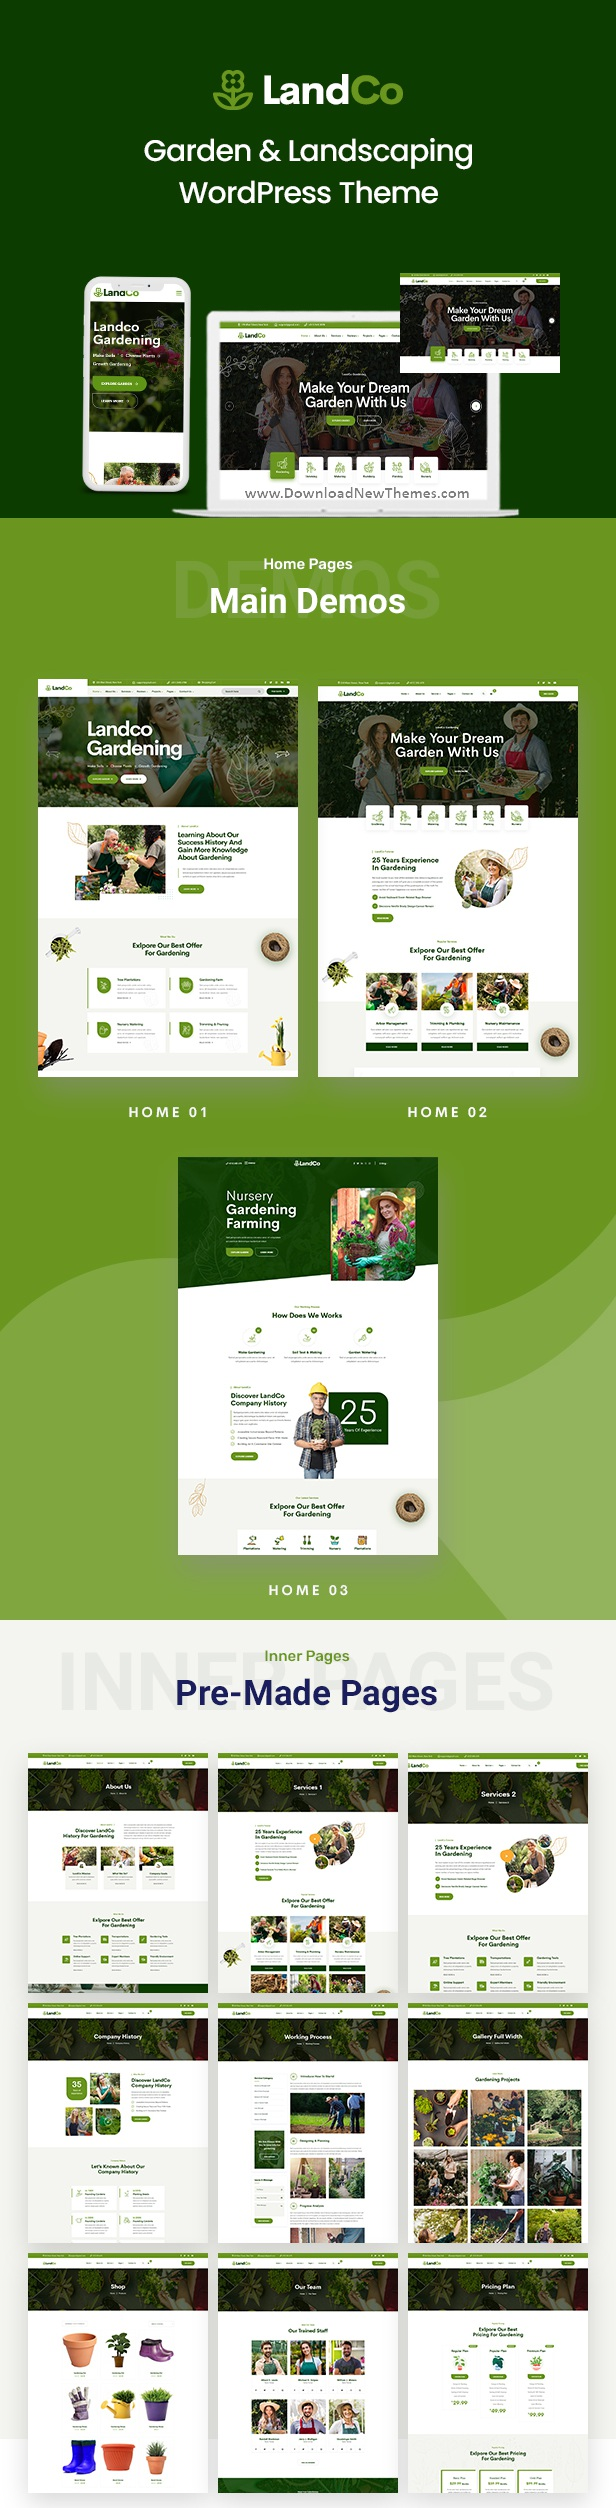 Garden and Landscaping WordPress Theme